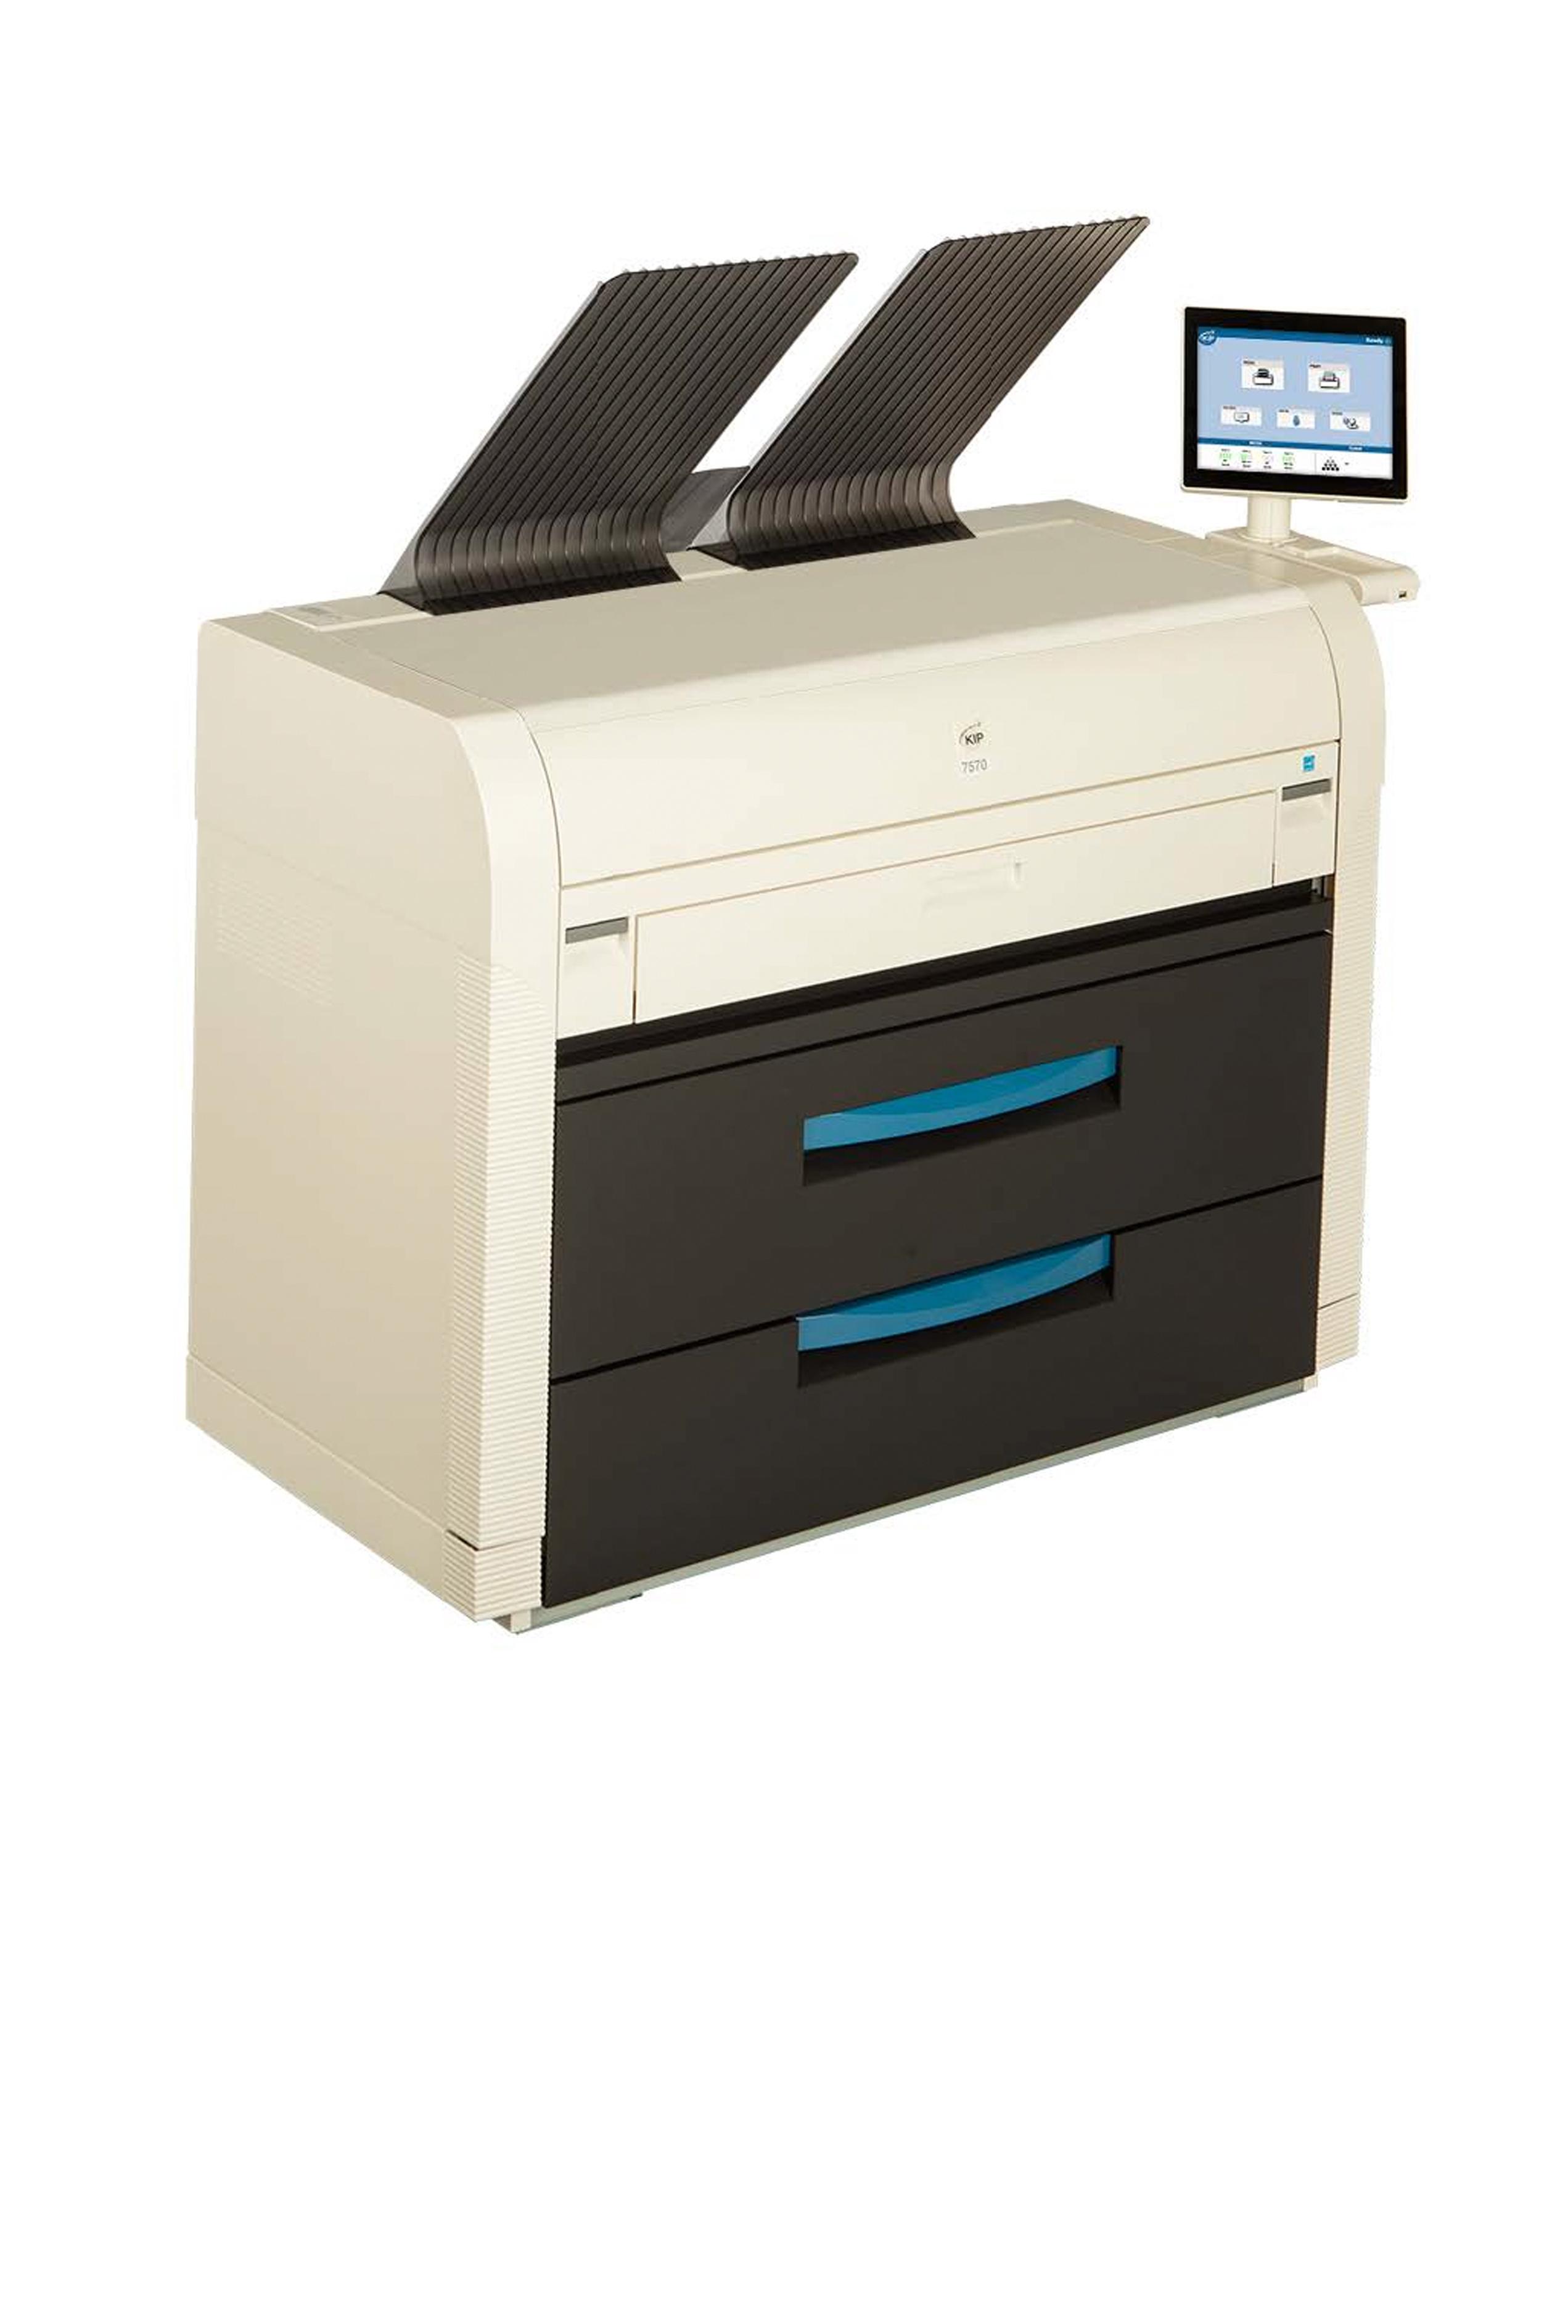 Kip 7580 MFP SYSTEM - 10 D PPM 600 Prints Per Hour 4 Roll MFP...